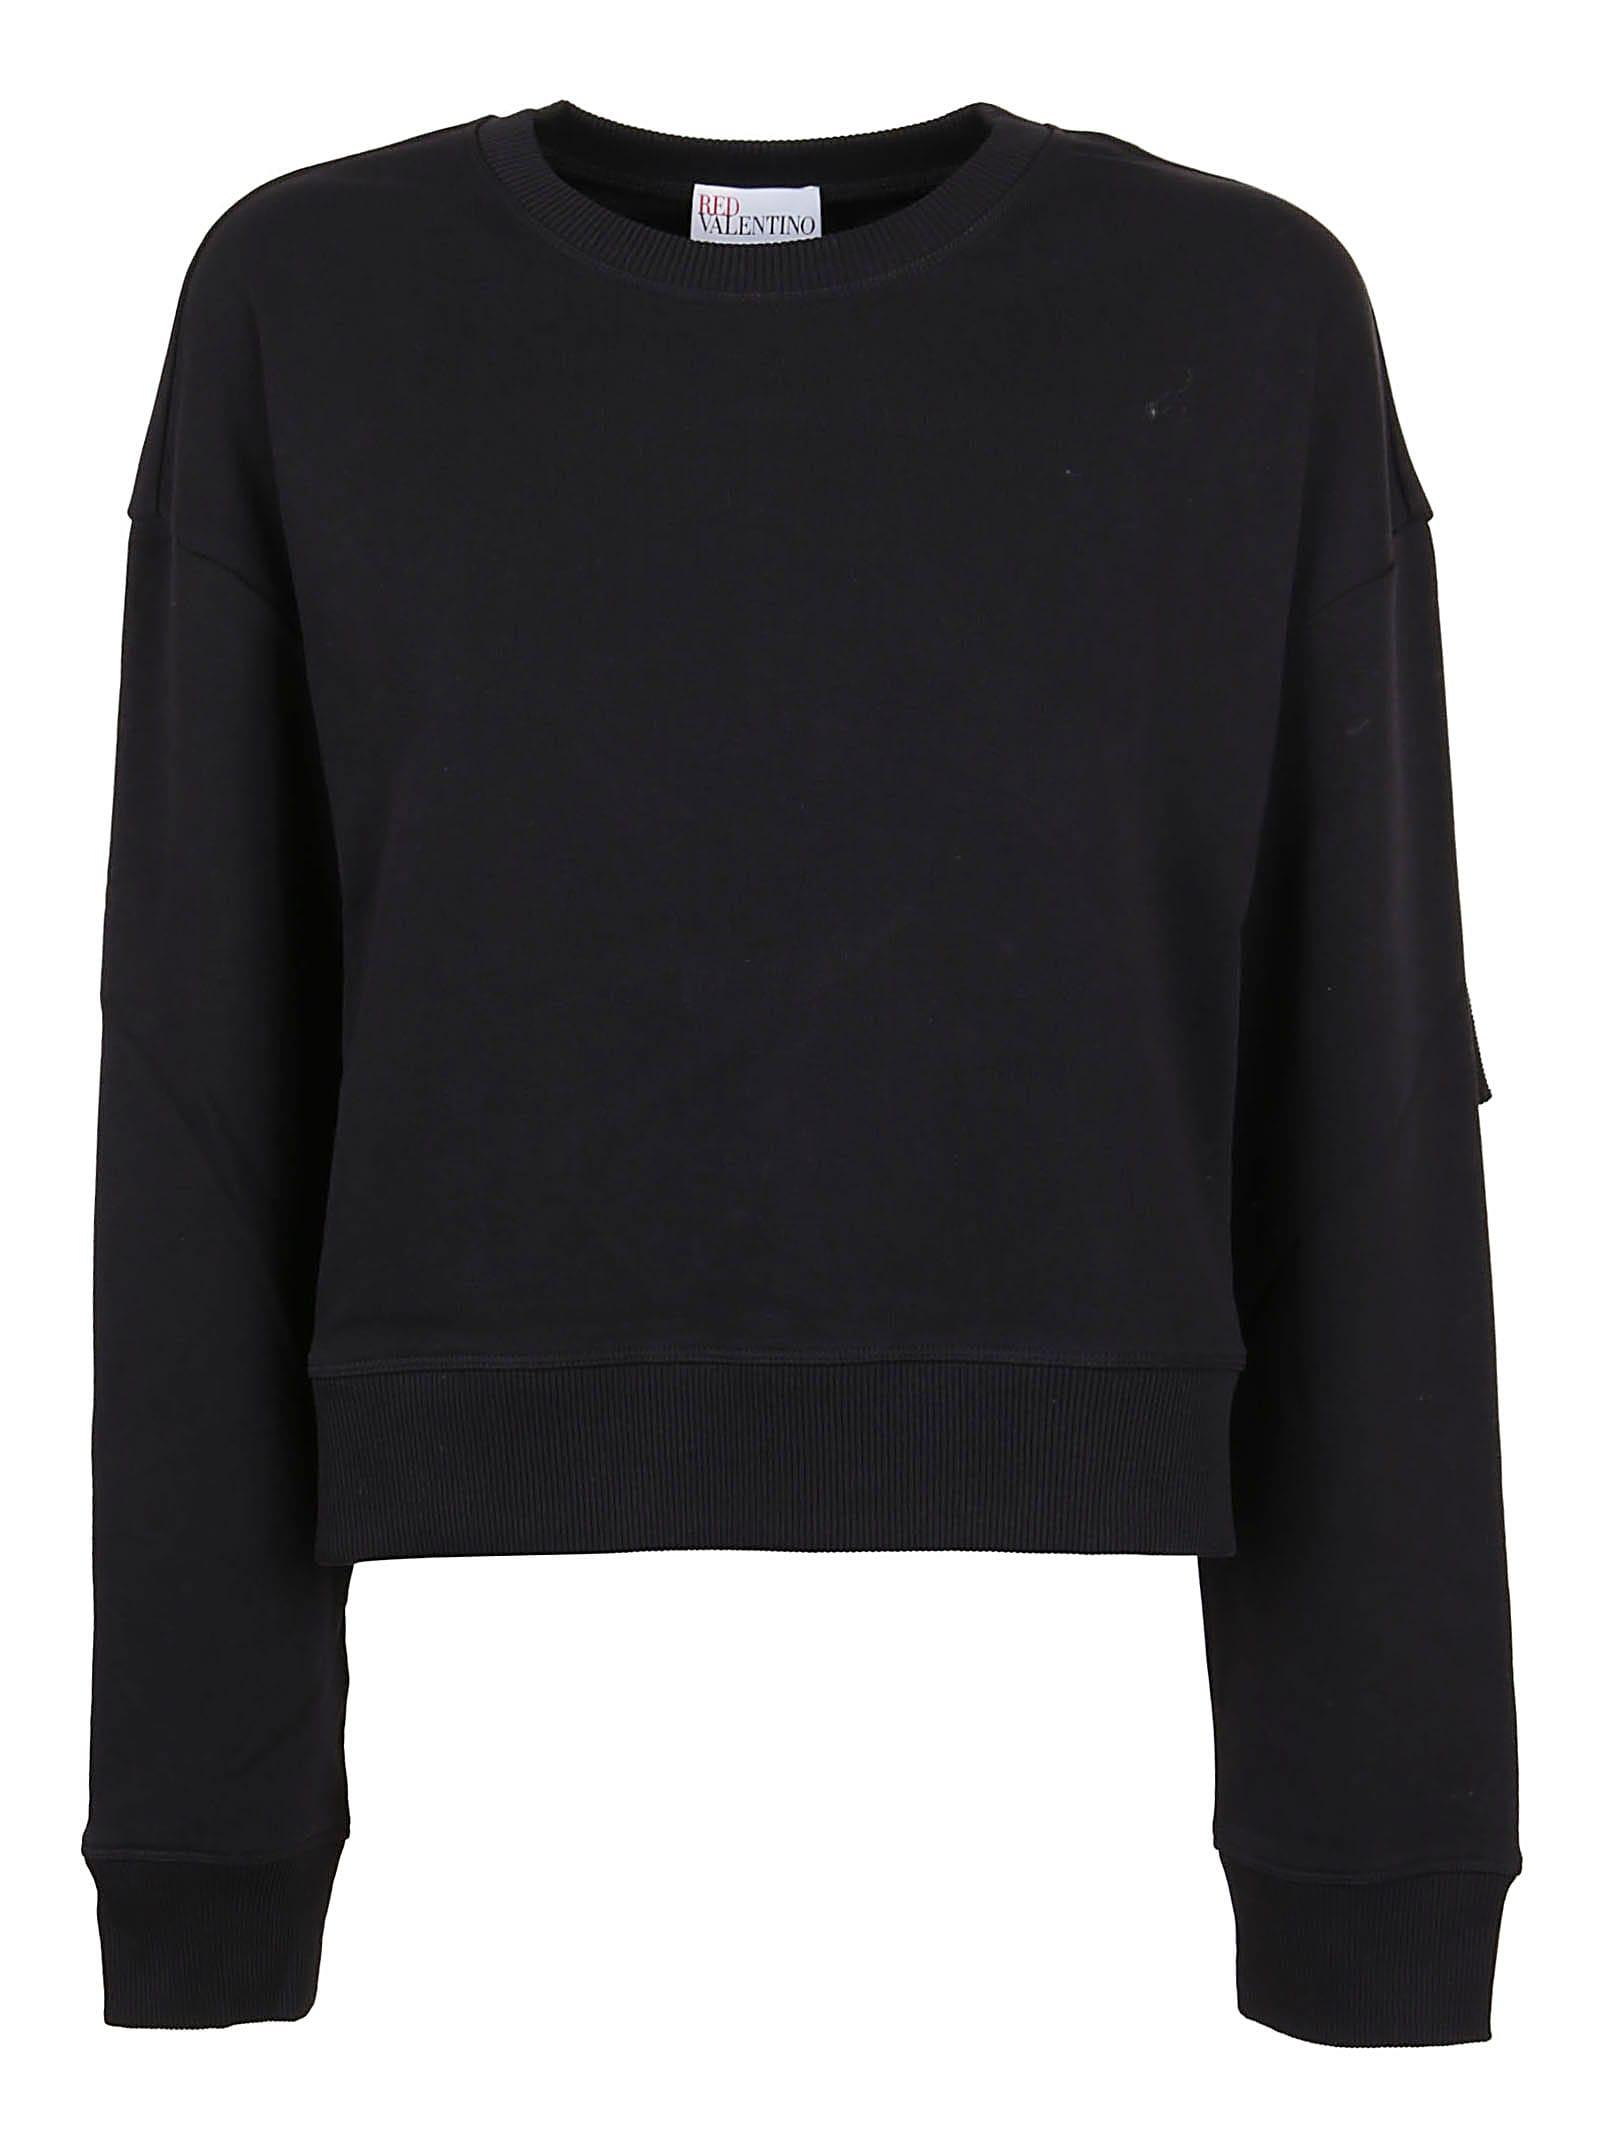 RED Valentino Sweatshirt